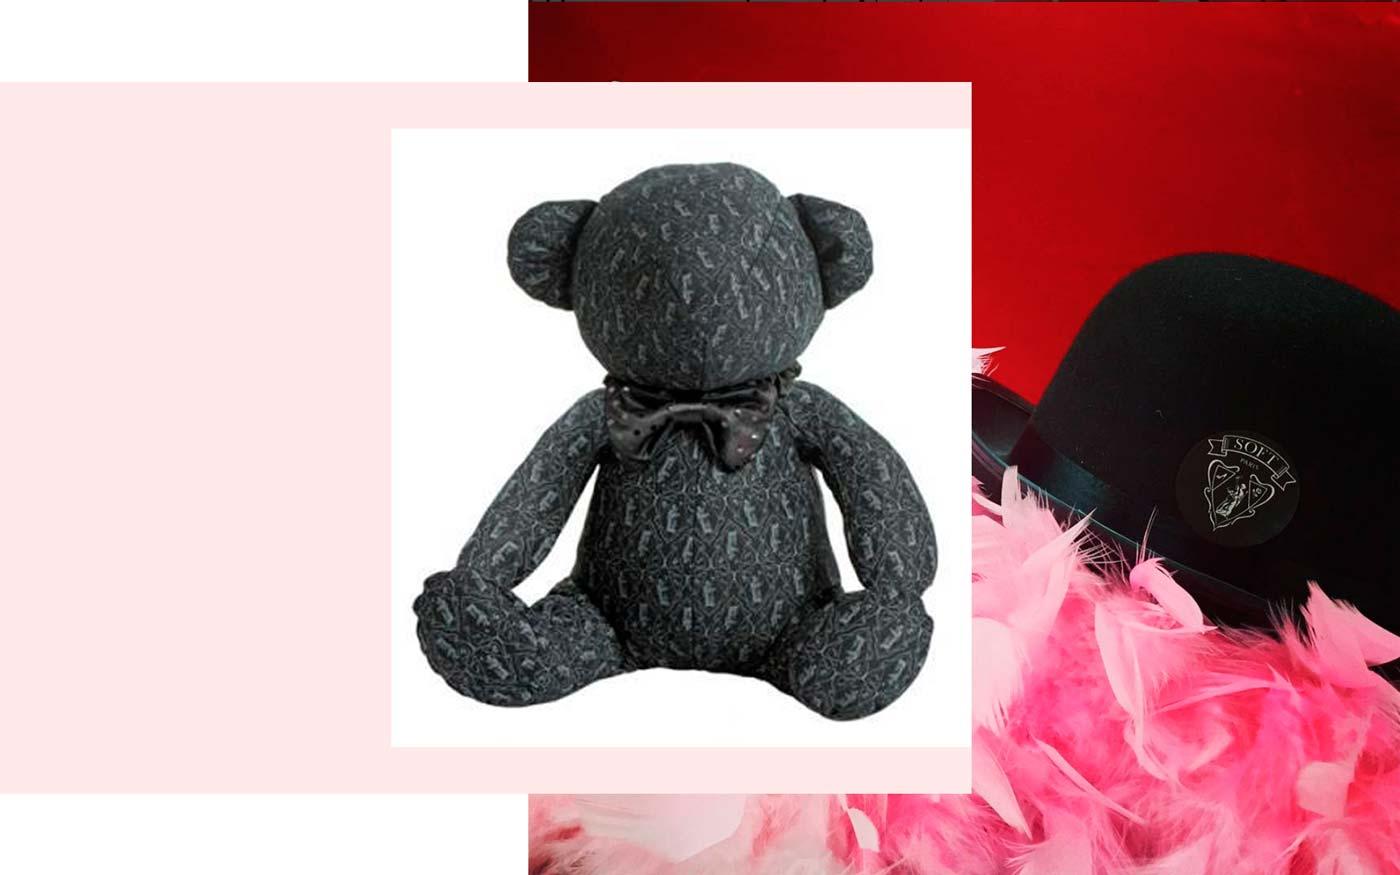 ours soft paris teddy bear sex toys